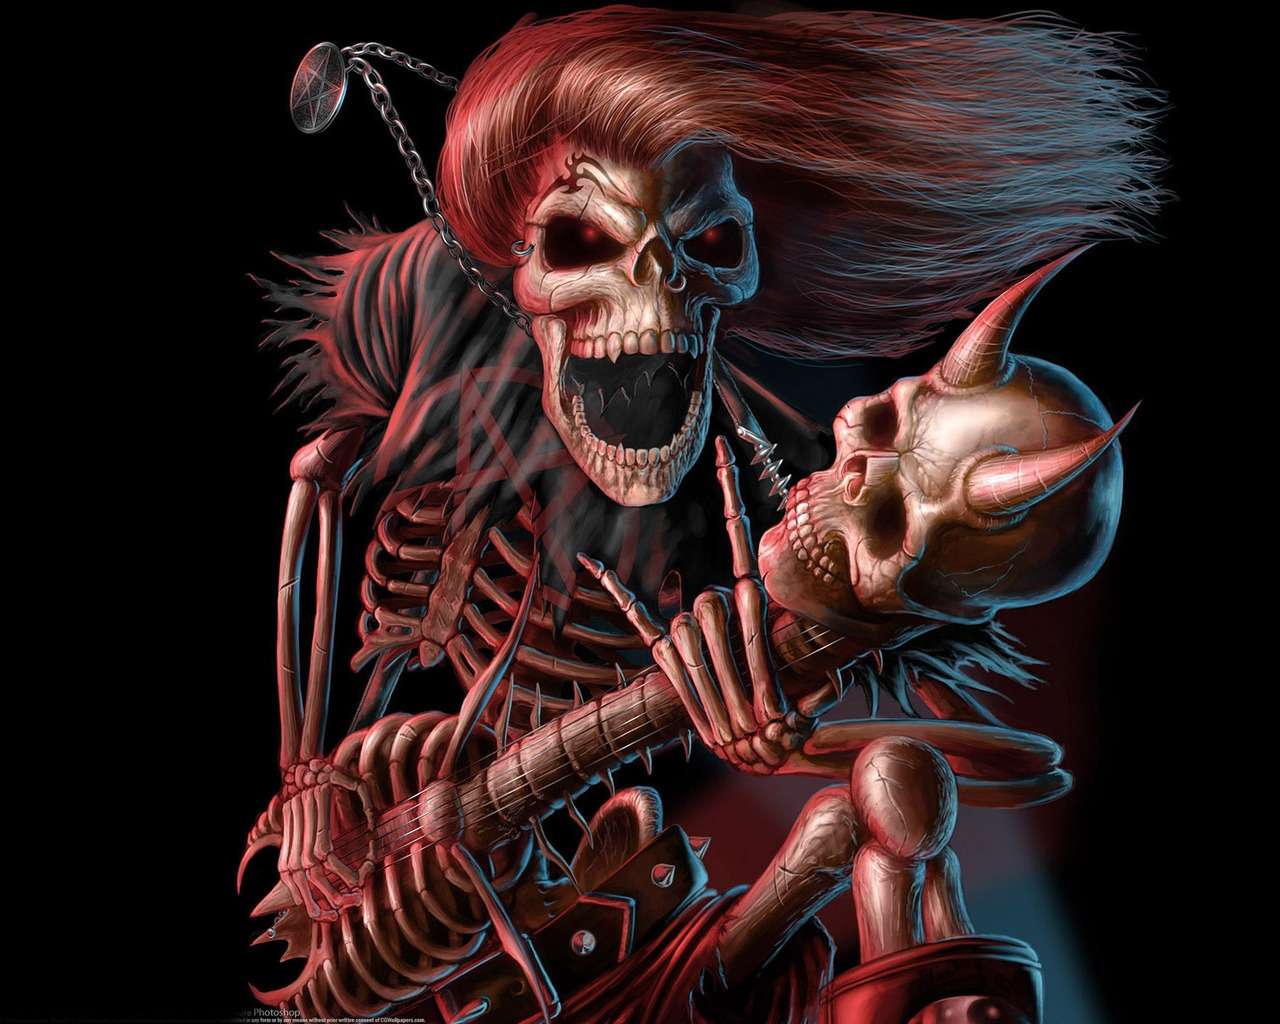 http://3.bp.blogspot.com/-vWHIo77kwFo/TqPQ8jpmnTI/AAAAAAAACqE/XBEh0u0NAAE/s1600/Skull+_wallpapers_Skull_Guitarist_Pentagram.jpg